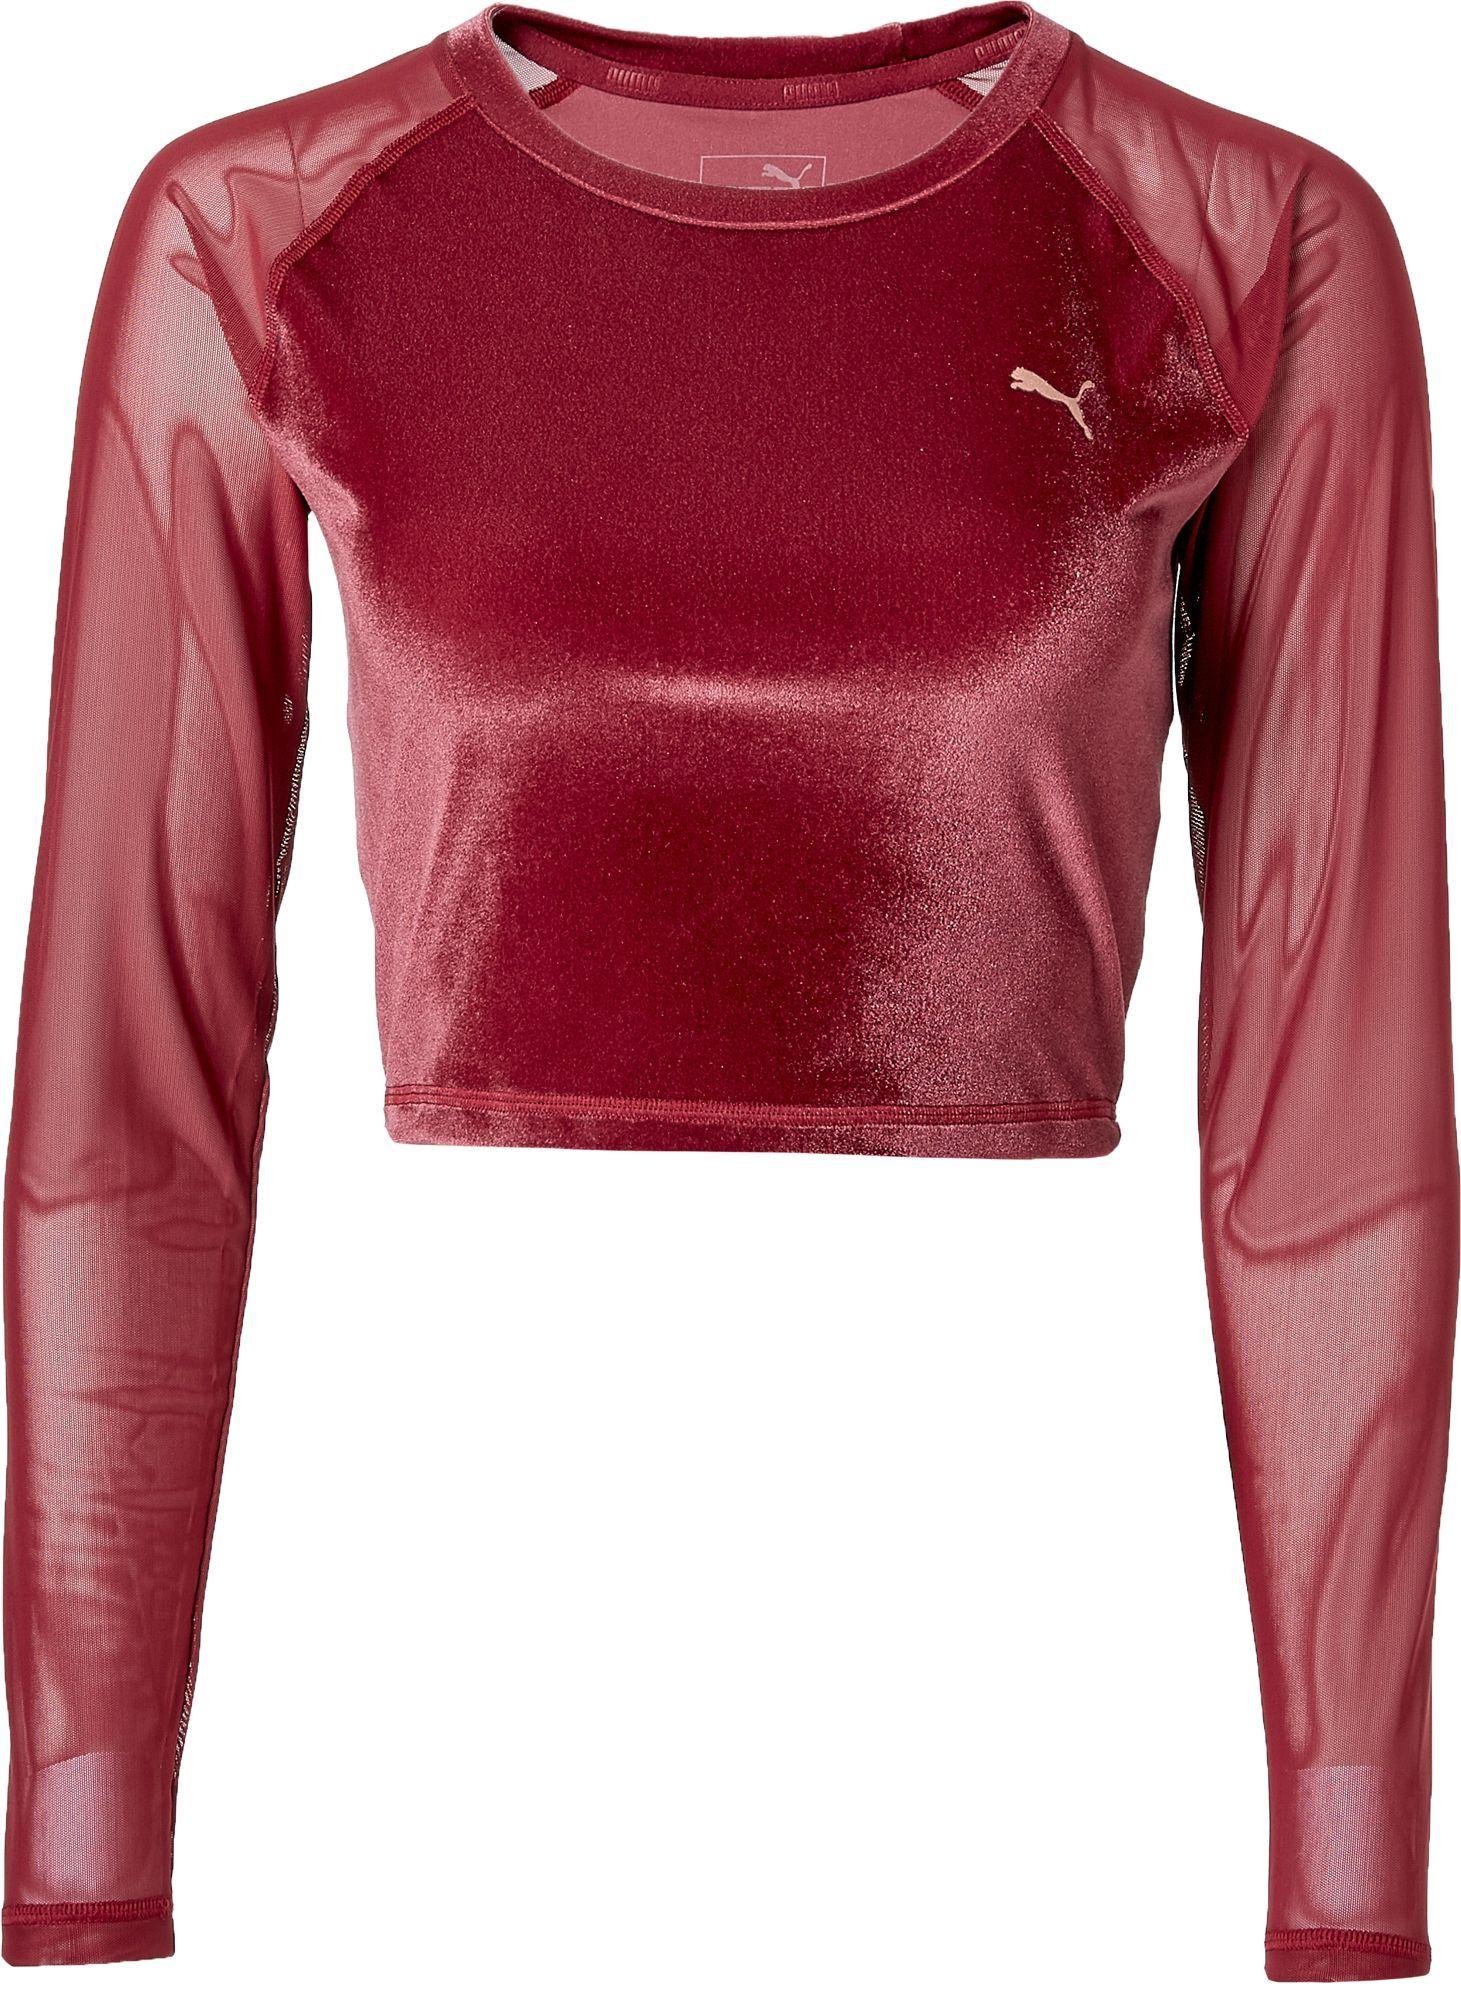 5fbaa3a9f93 Puma Women's Explosive Velvet Crop Top, Size: Large, Brown ...